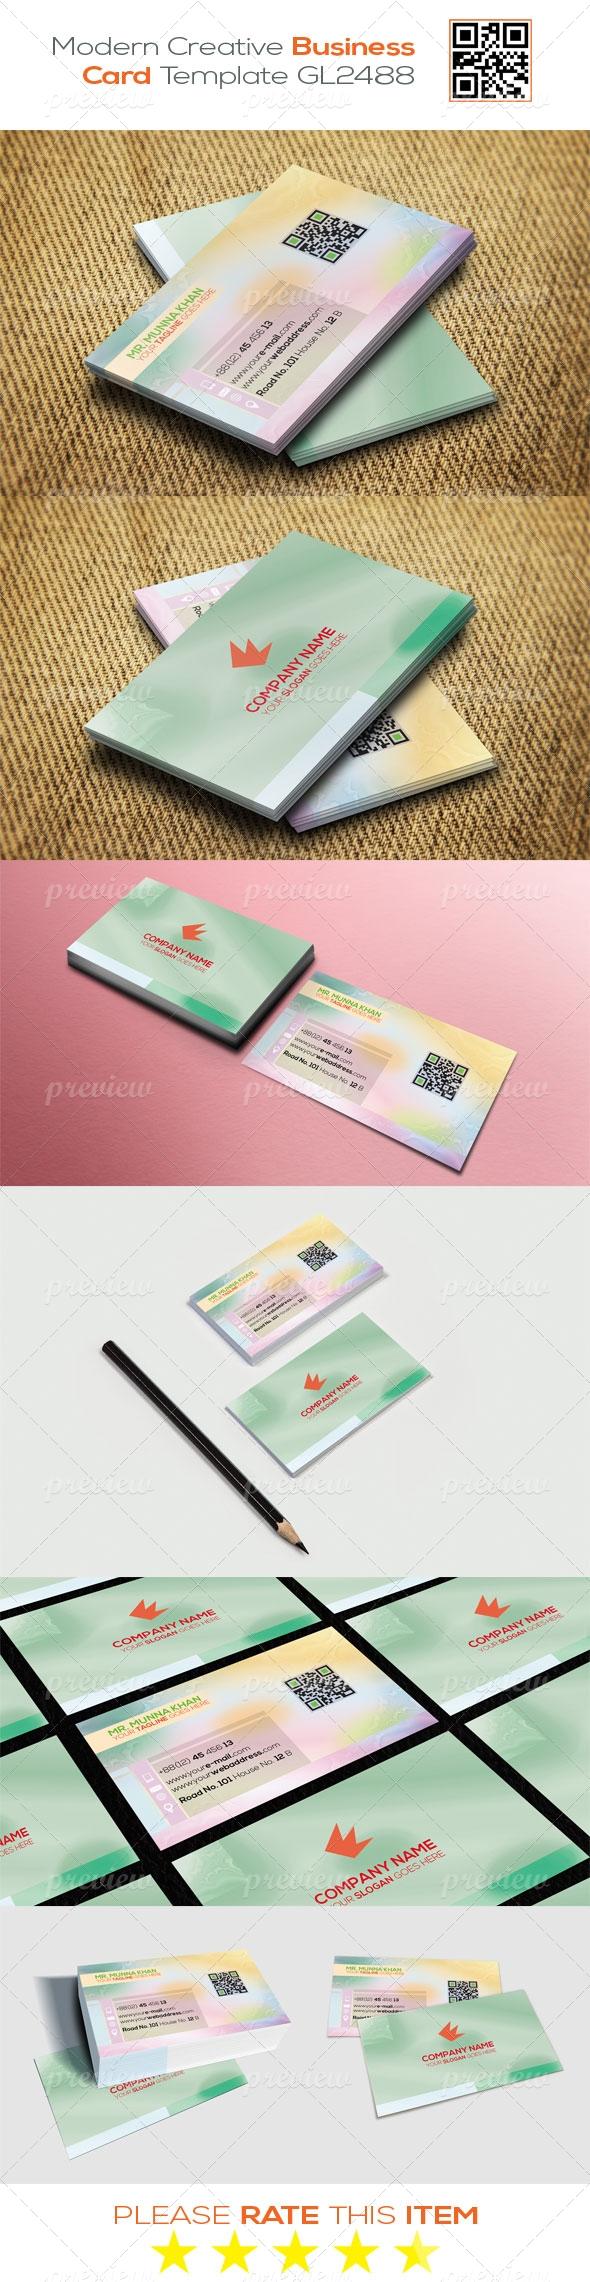 Modern Creative Business Card Template GL2488